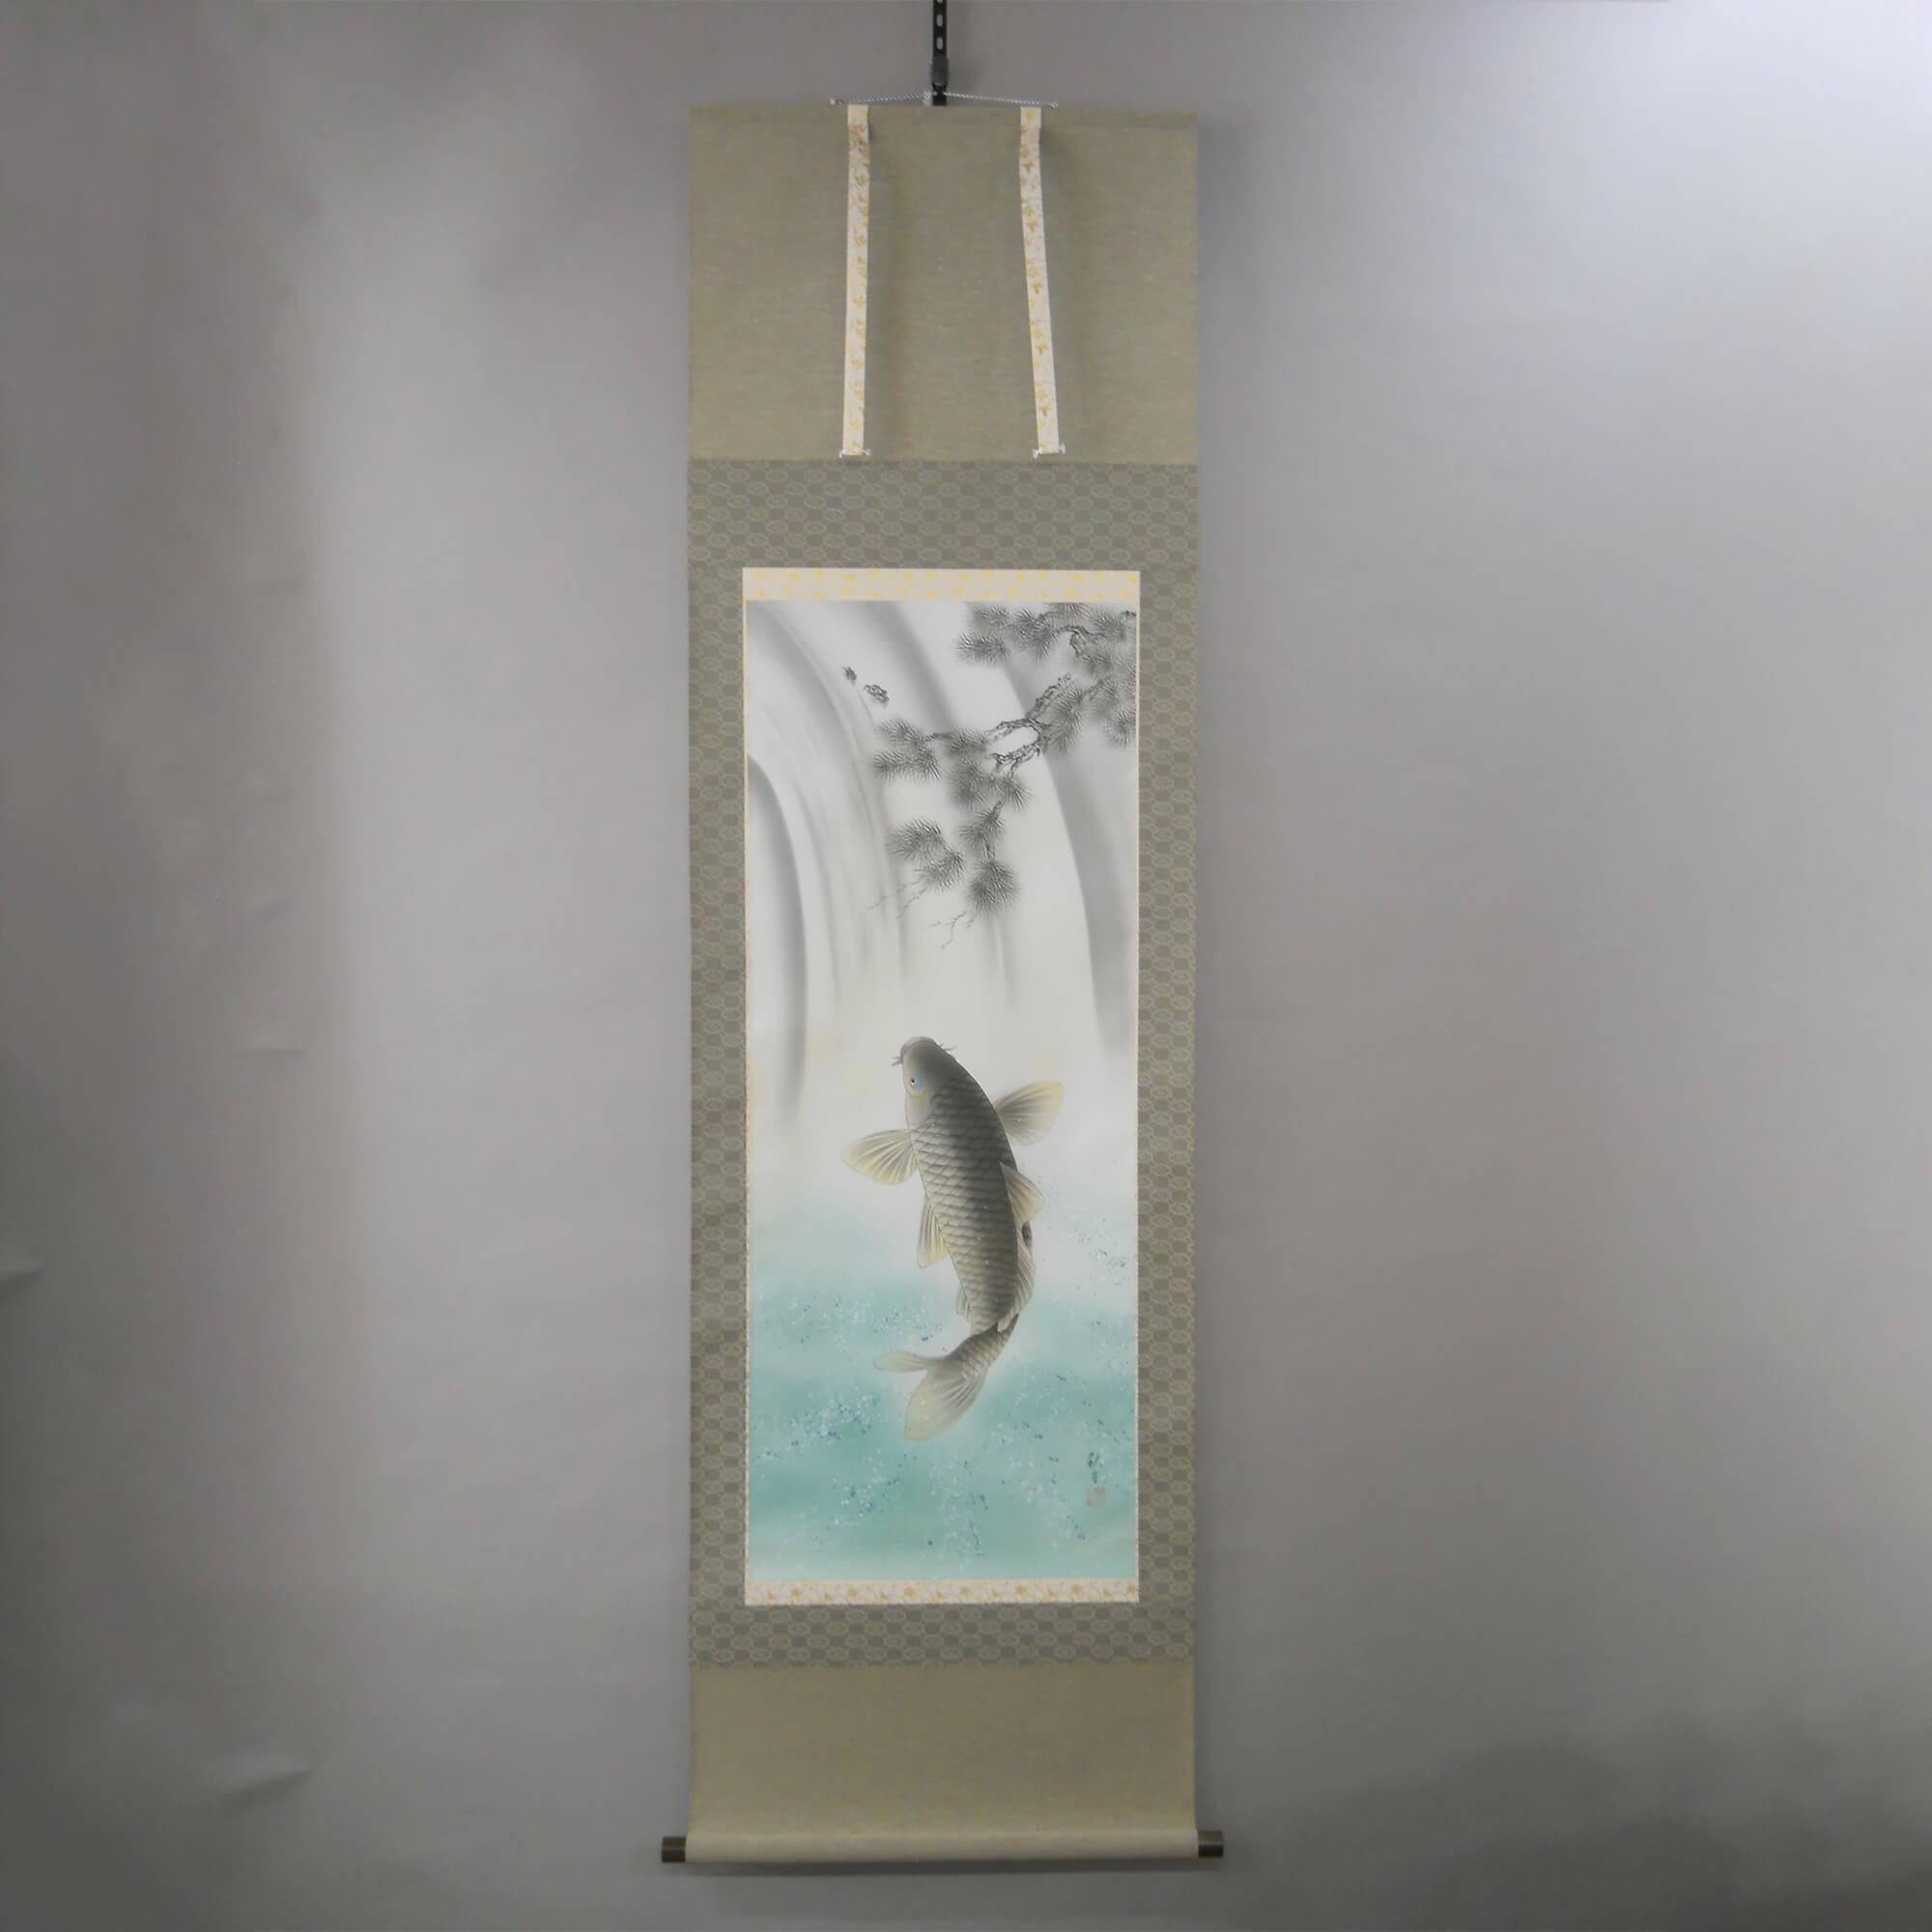 Koi Fish Shooting up a Waterfall / Shūgetsu Kawai